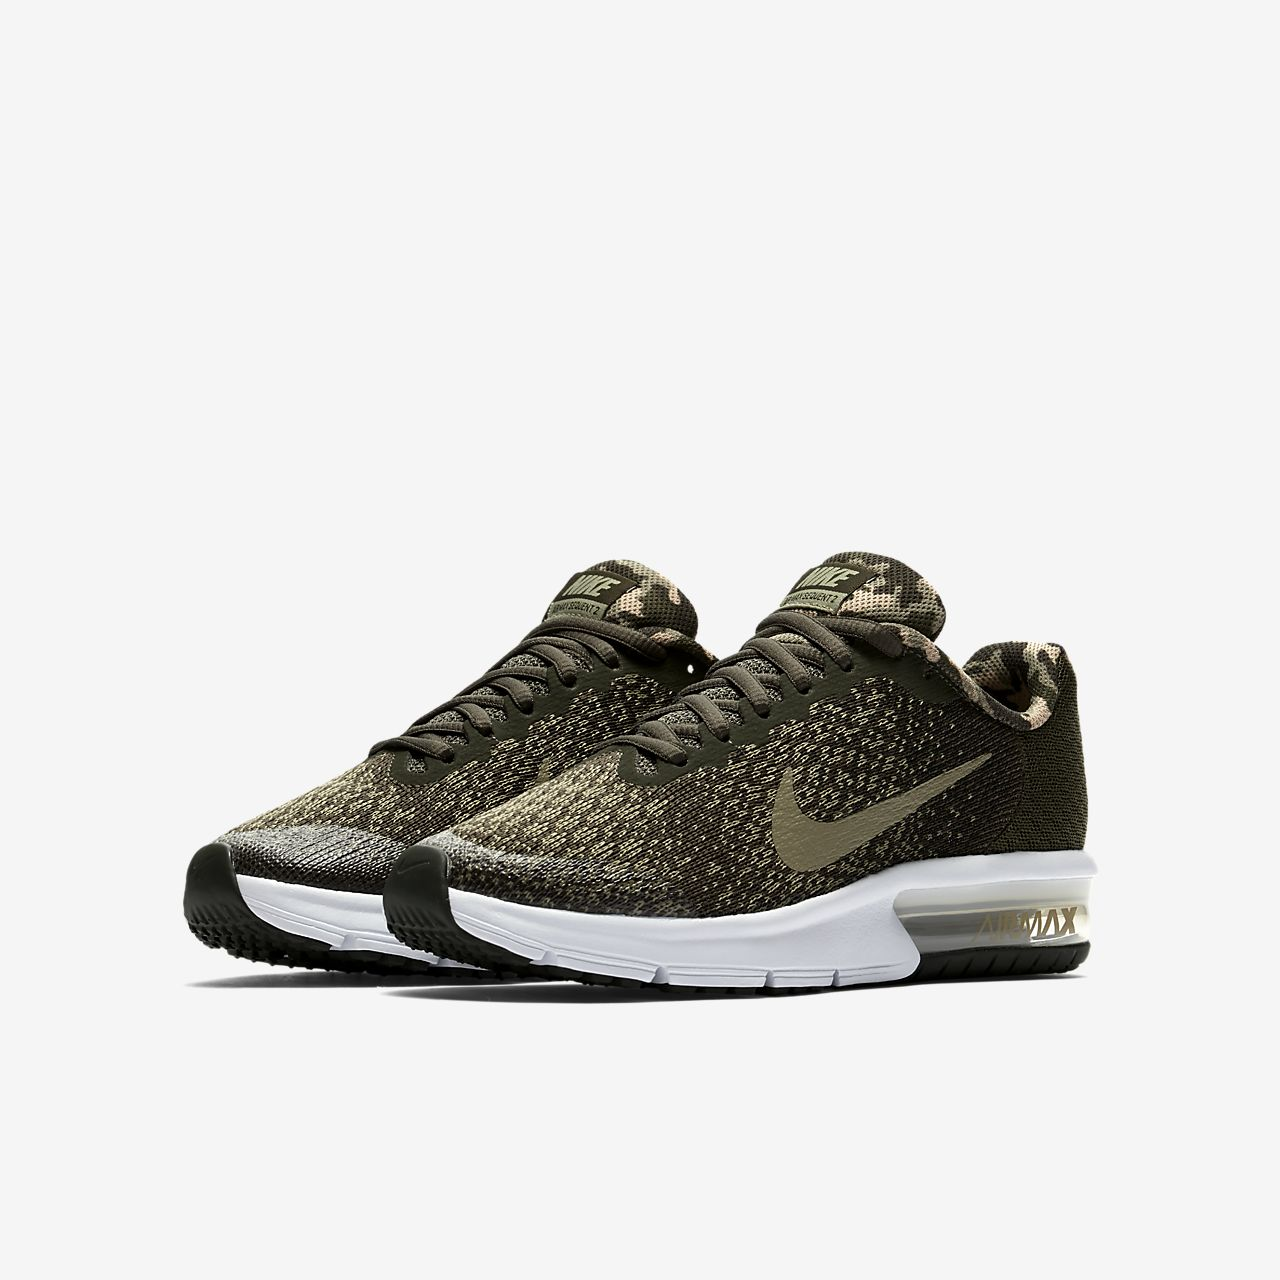 0b5cb8ec8c Nike Air Max Sequent 2 Older Kids' Shoe. Nike.com GB